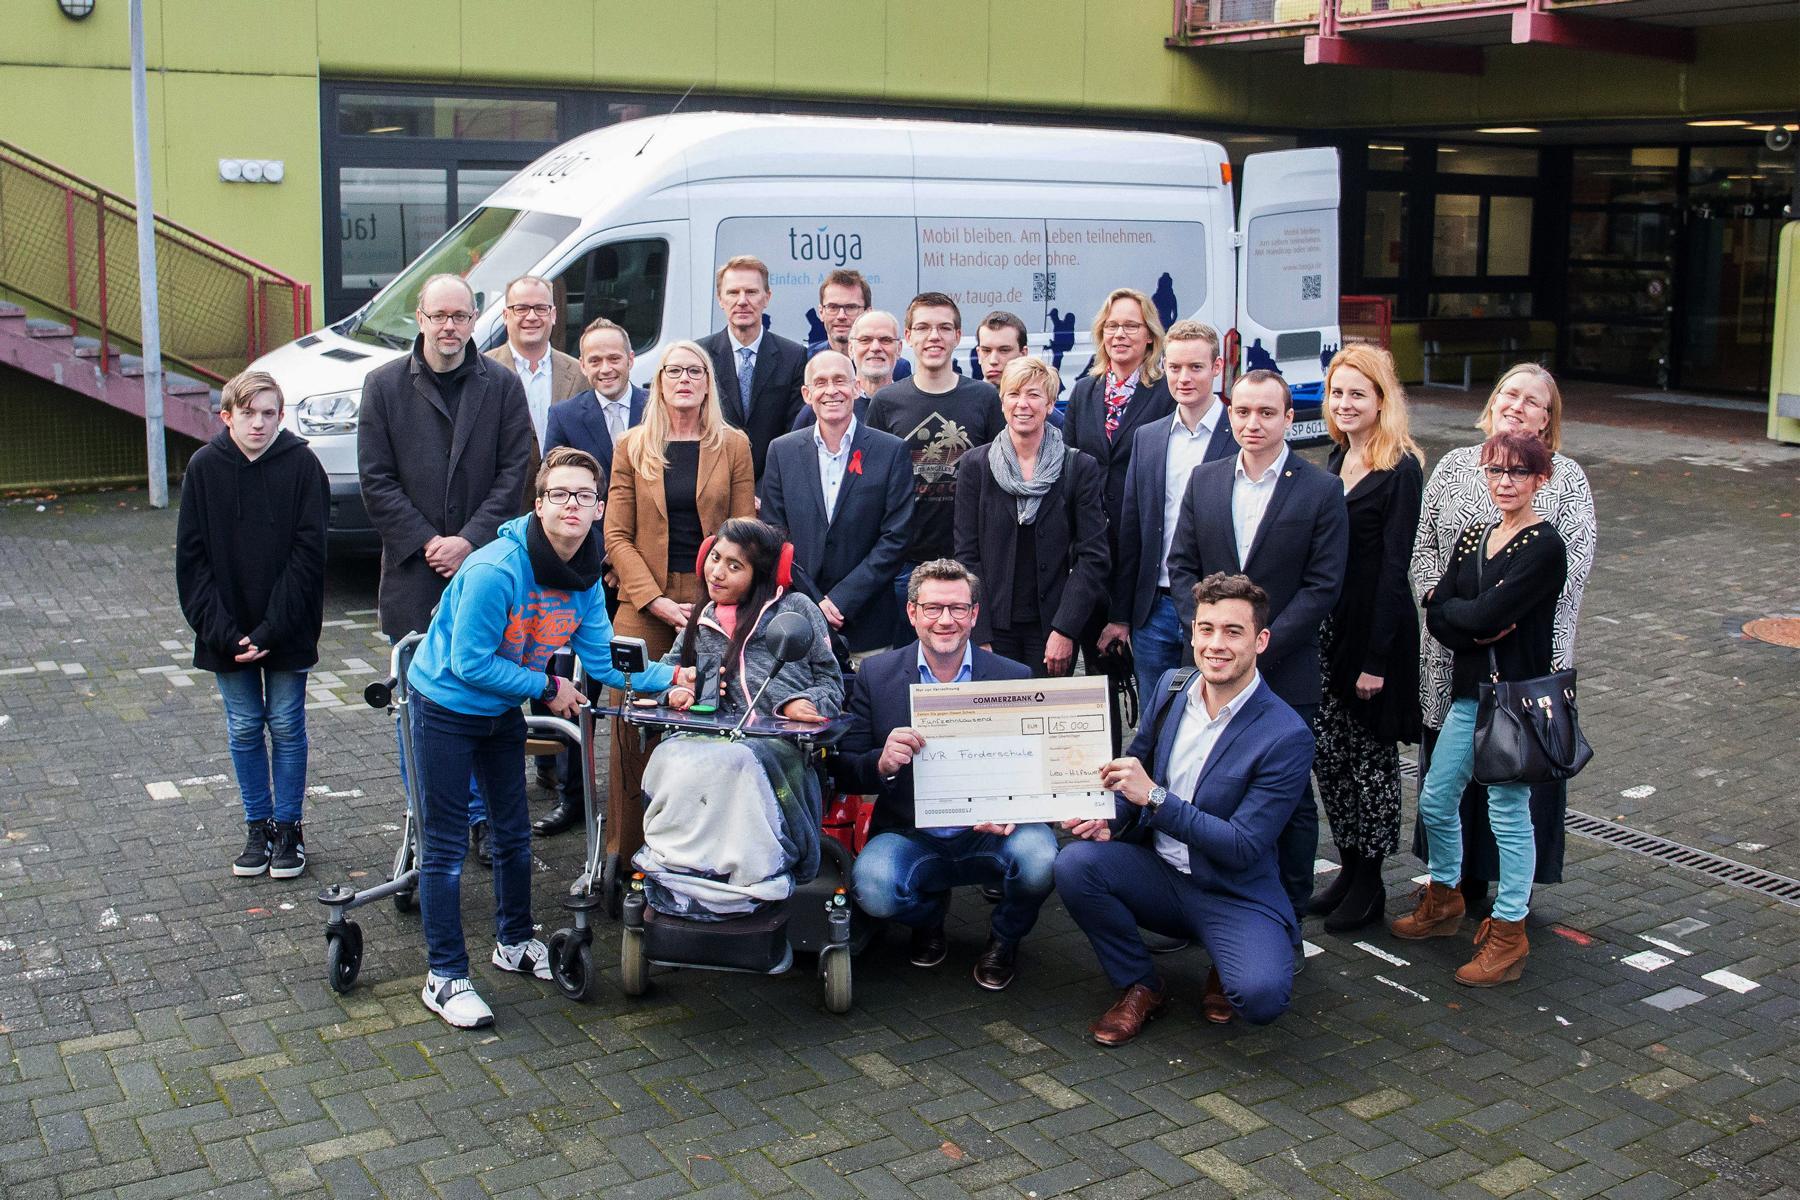 Leos spenden 15.000 Euro an LVR-Förderschule